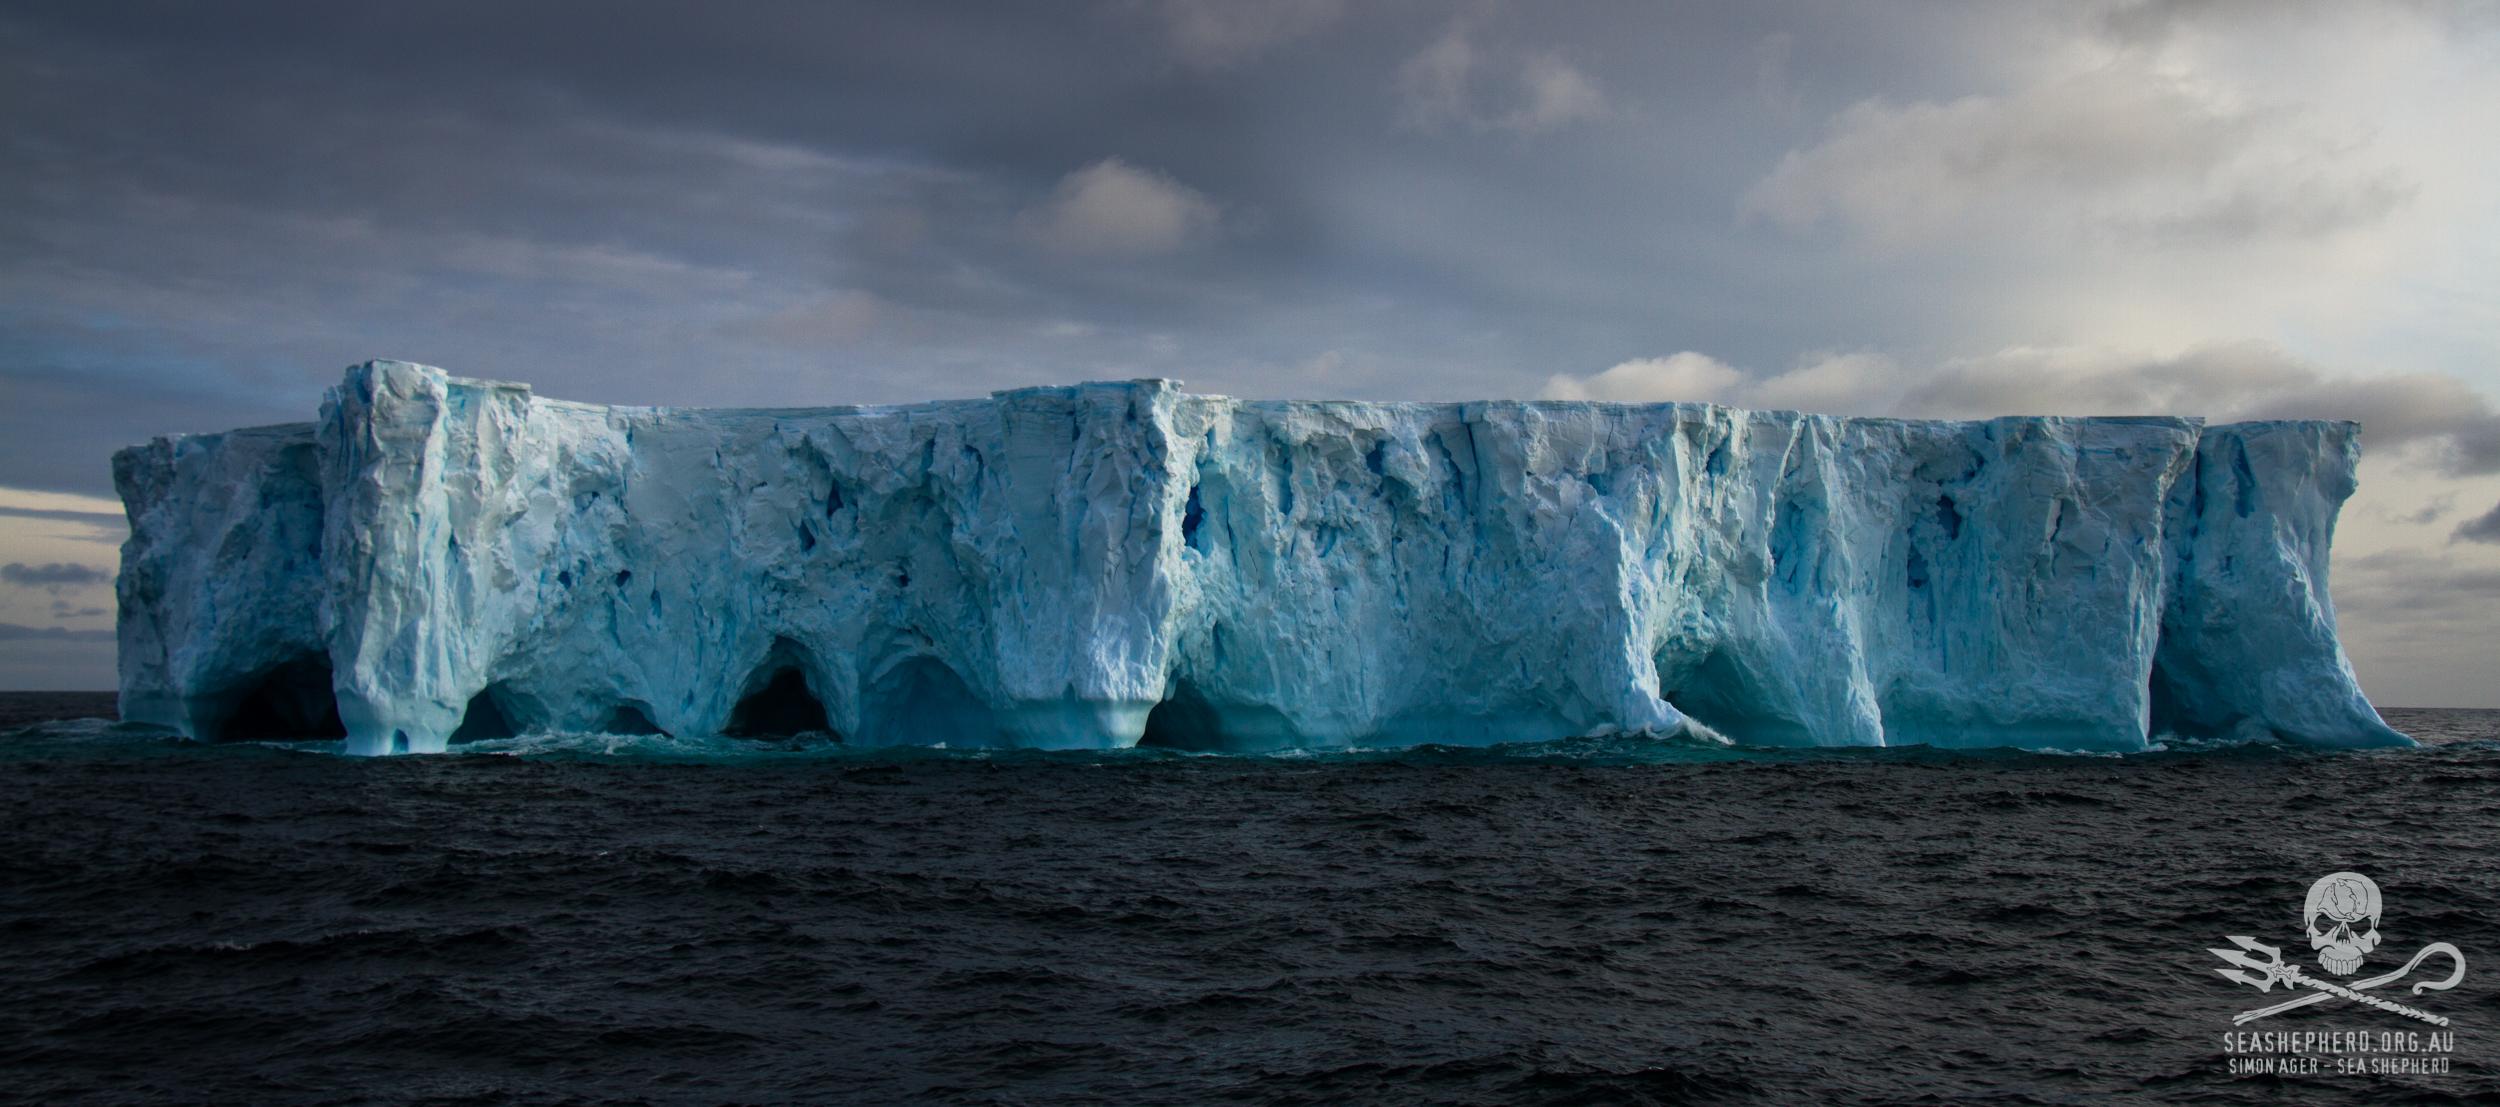 110213_SA_Iceberg_Sunset_Art_001_7828.jpg